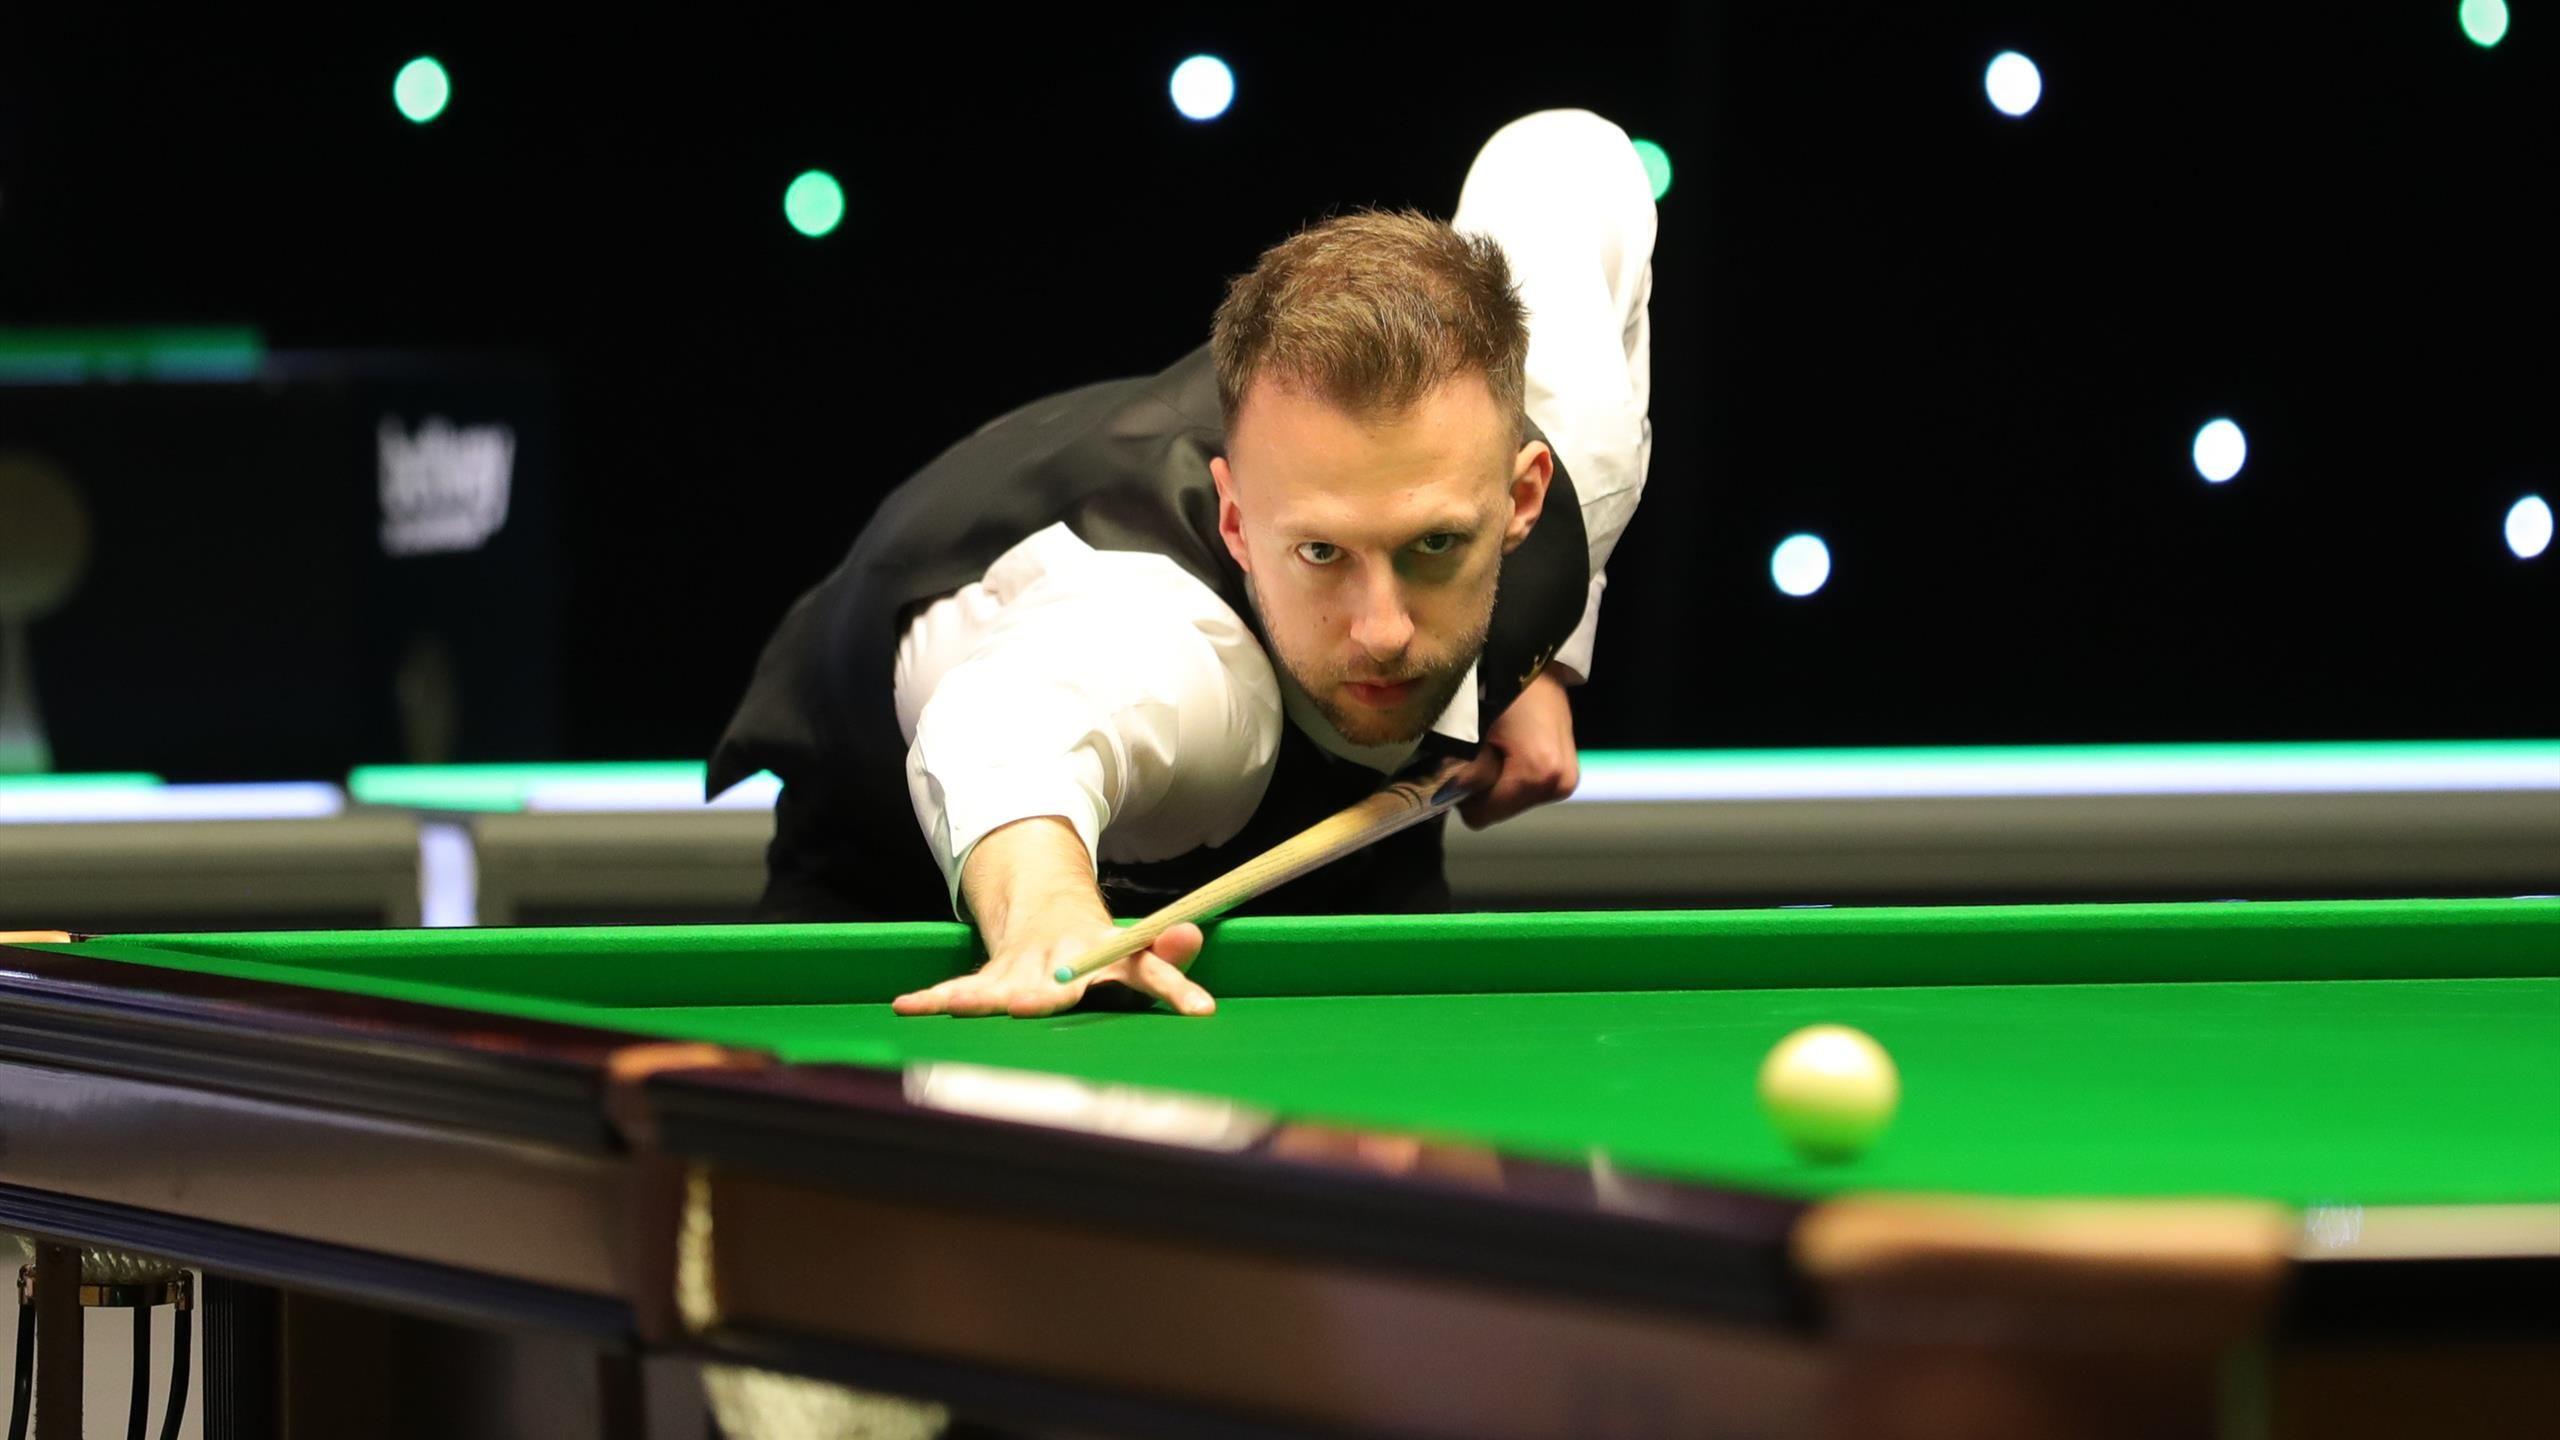 German Masters Snooker 2021 Draw Schedule Results Judd Trump John Higgins Ding Junhui Playing Eurosport